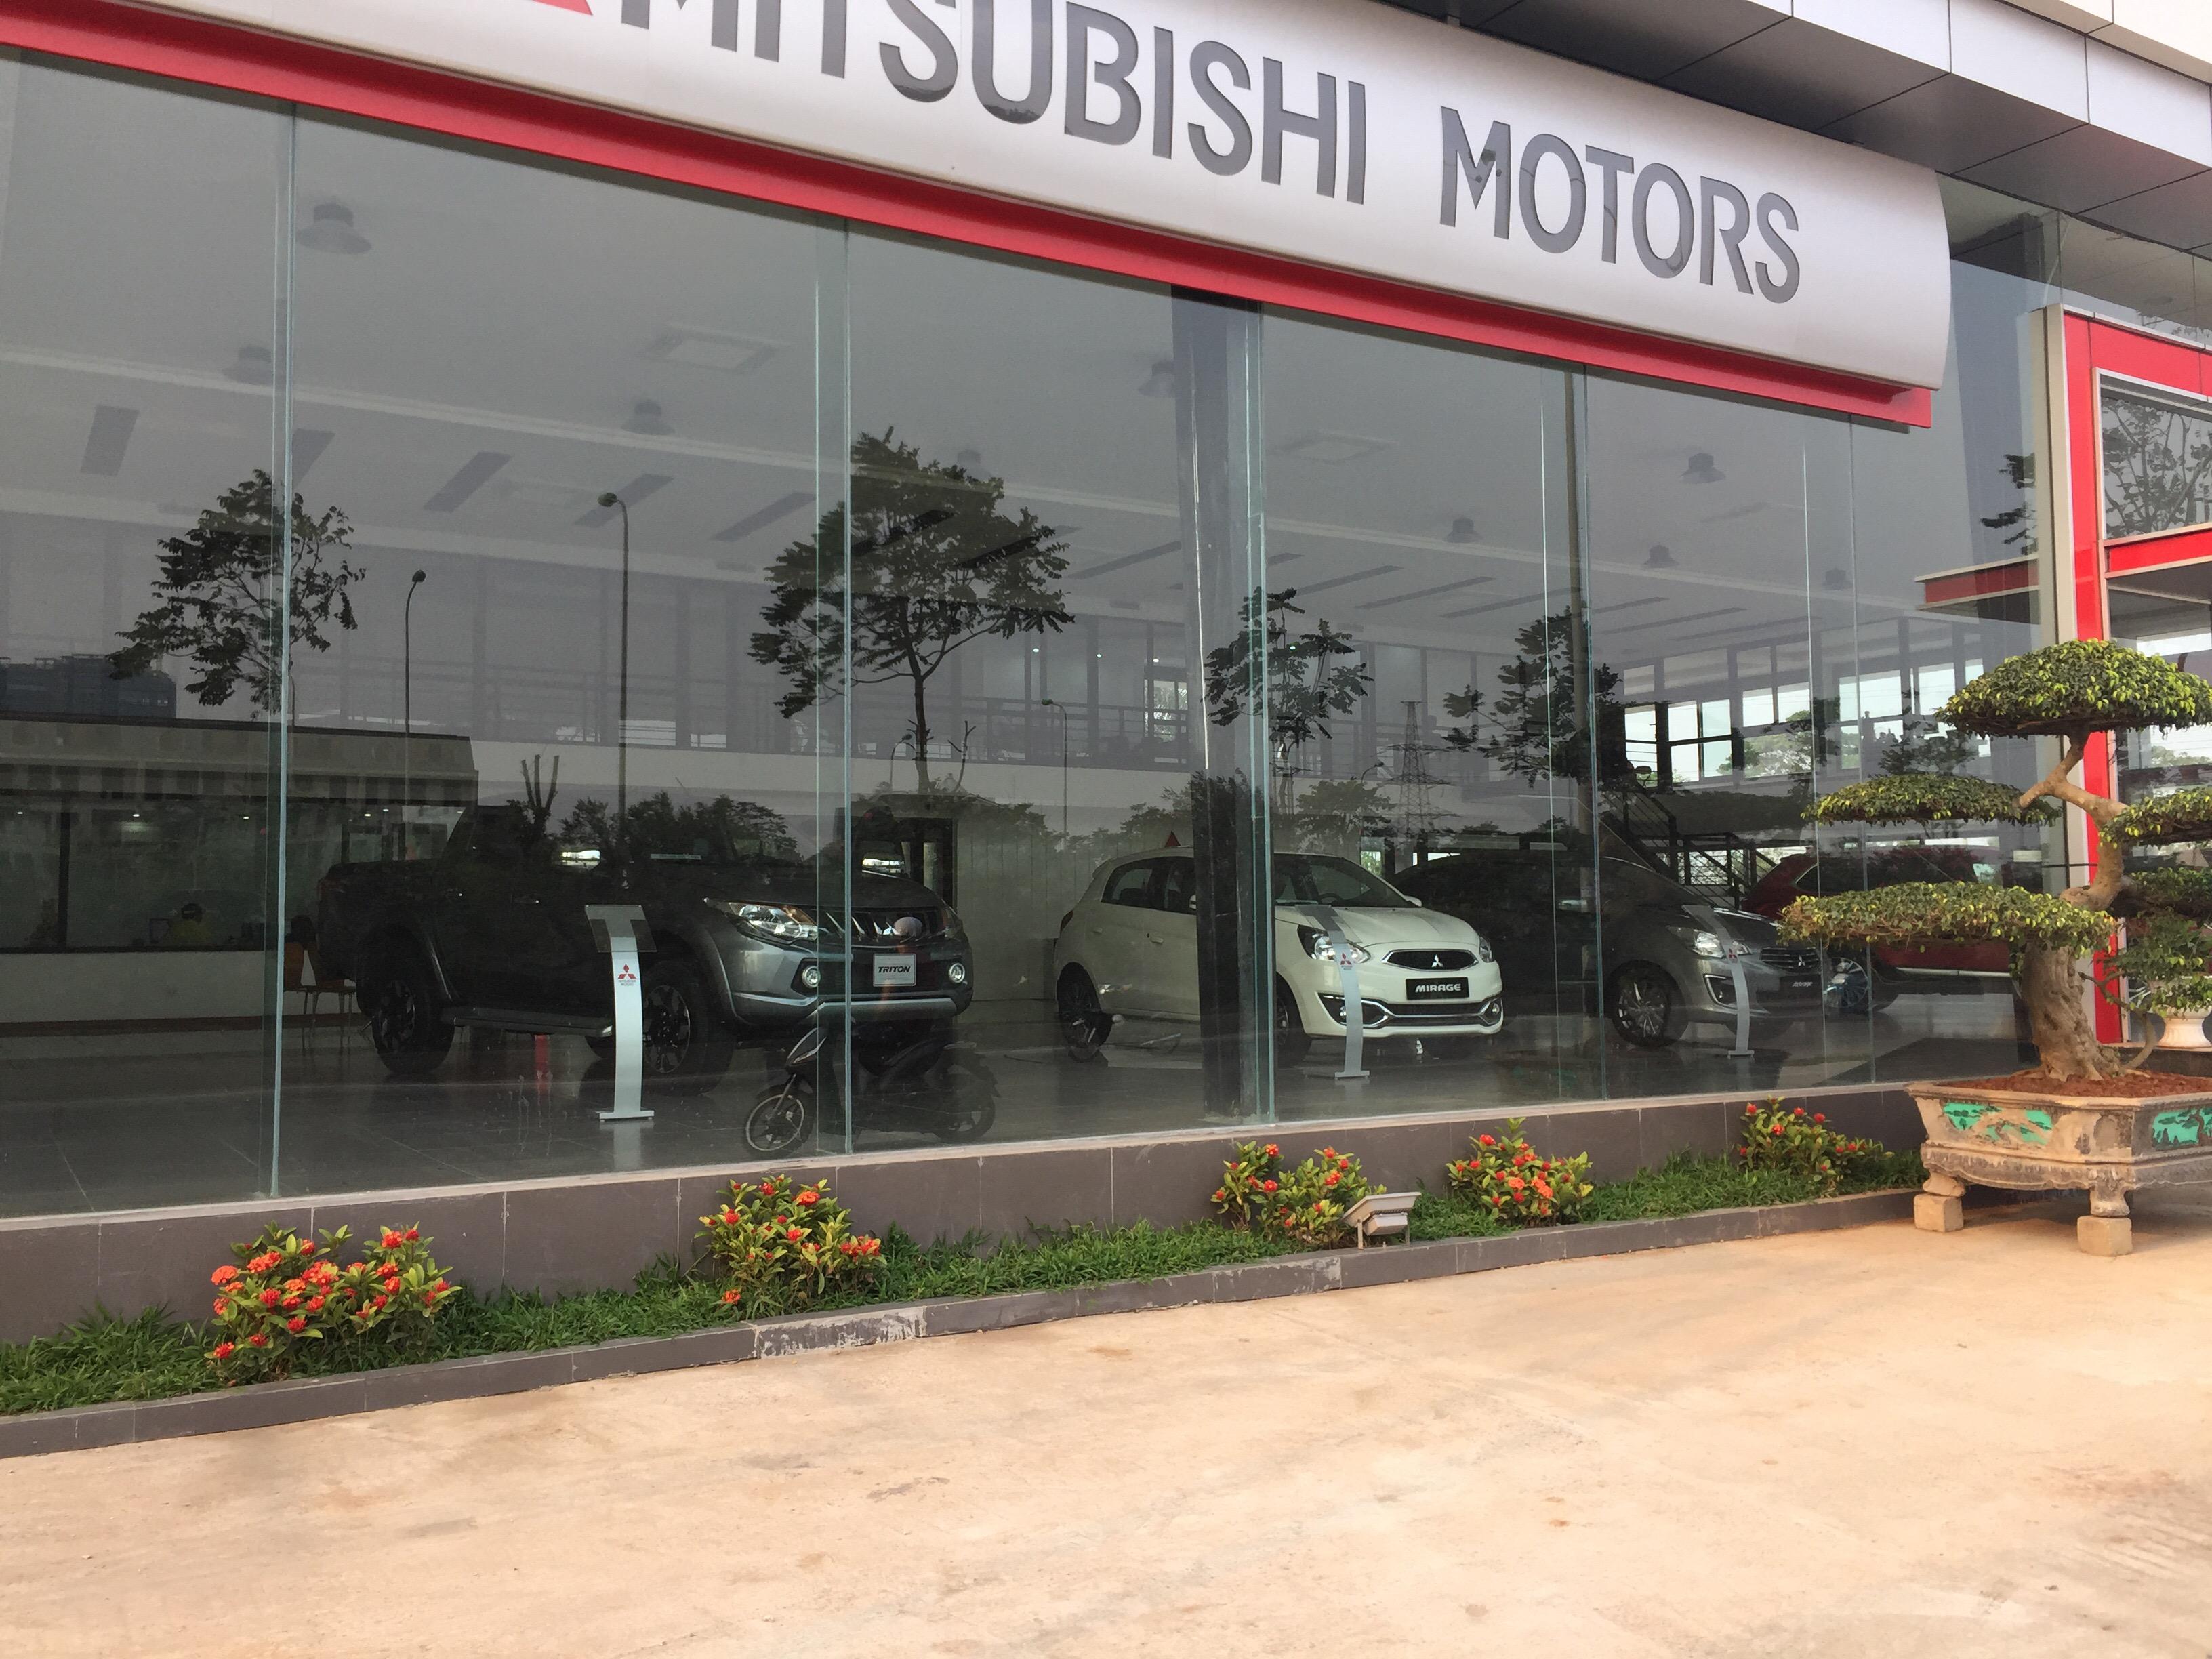 xe oto triton tại Mitsubishi Trung Thượng